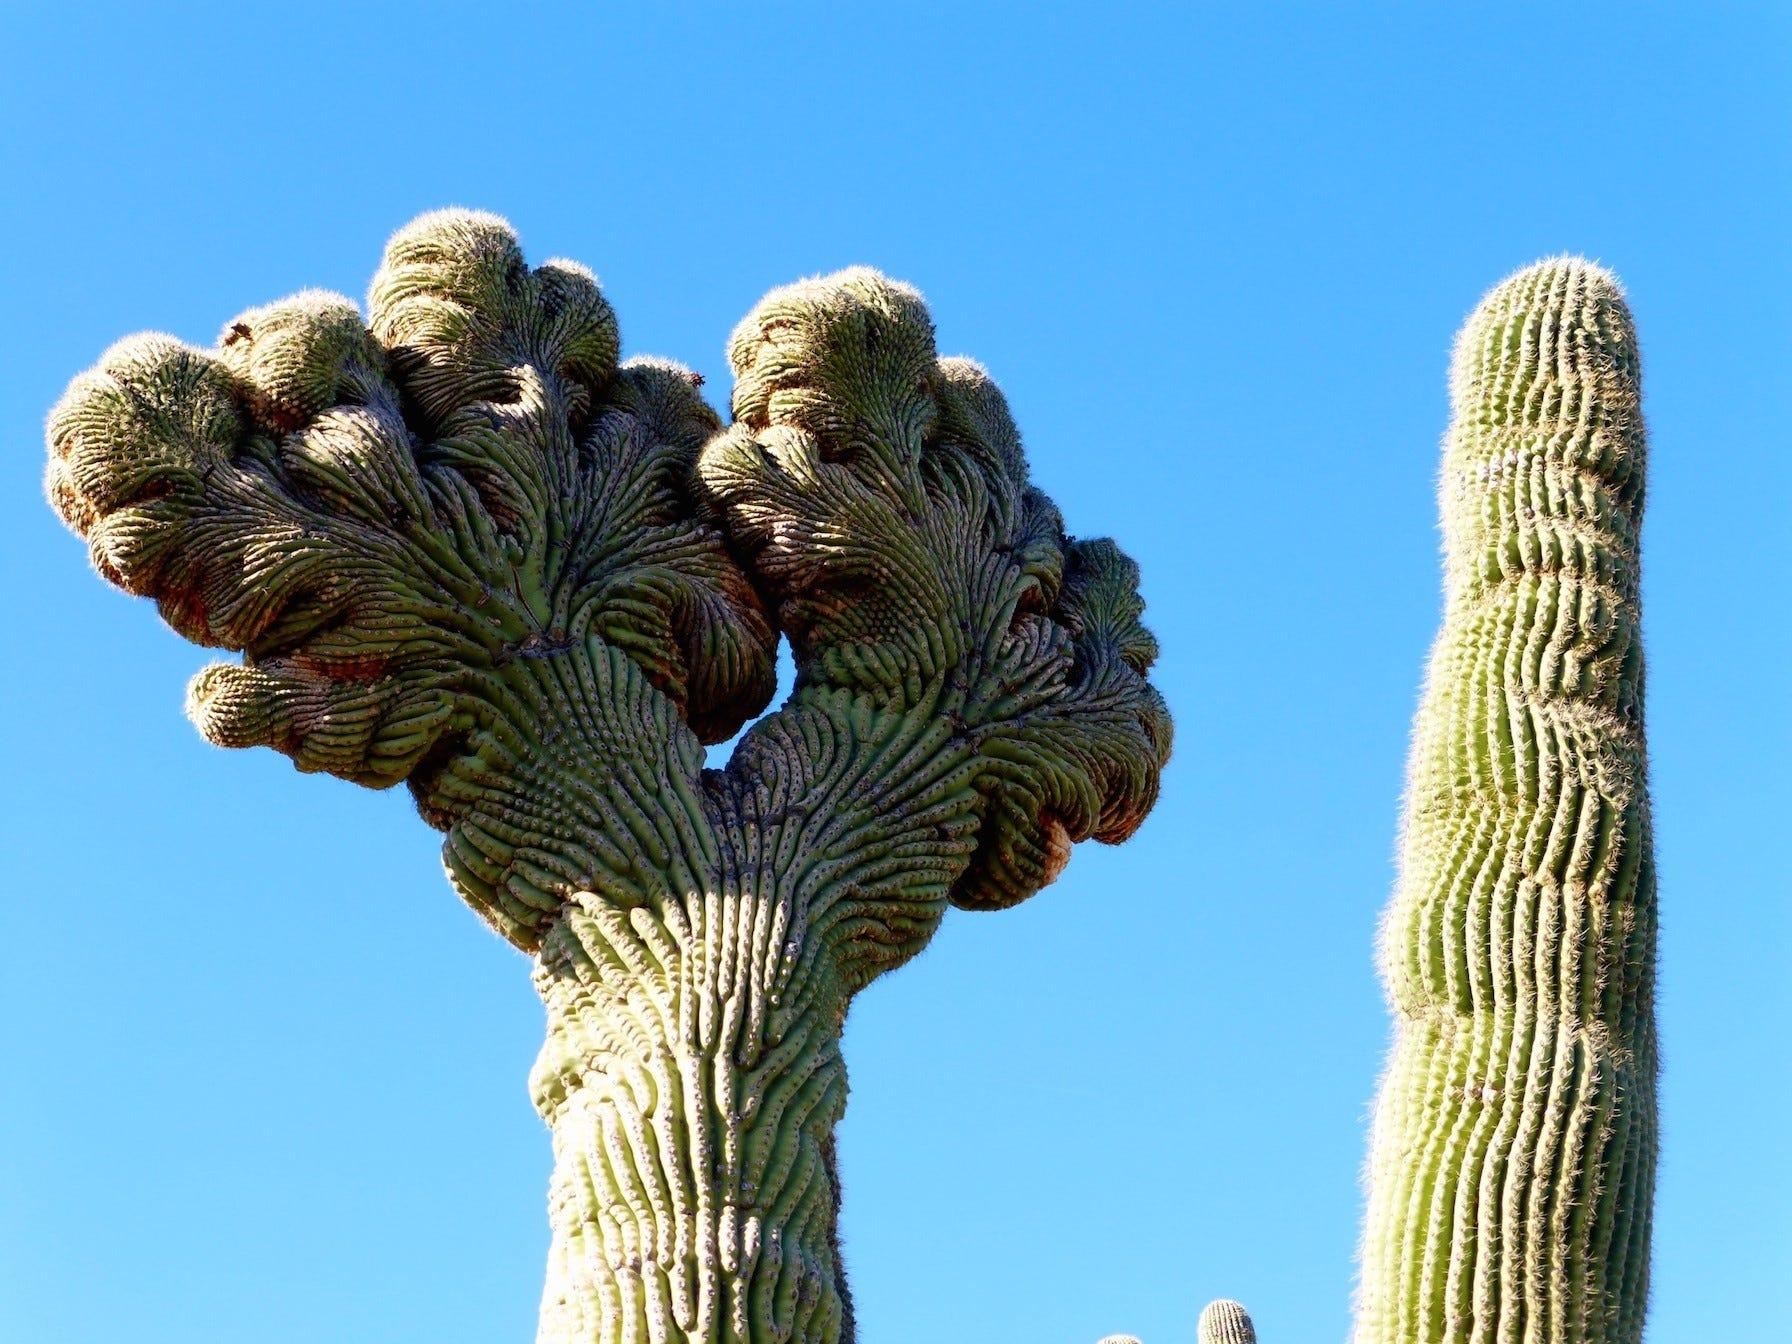 Arizona crested saguaro cactuses look like cartoonish broccoli. Here's why